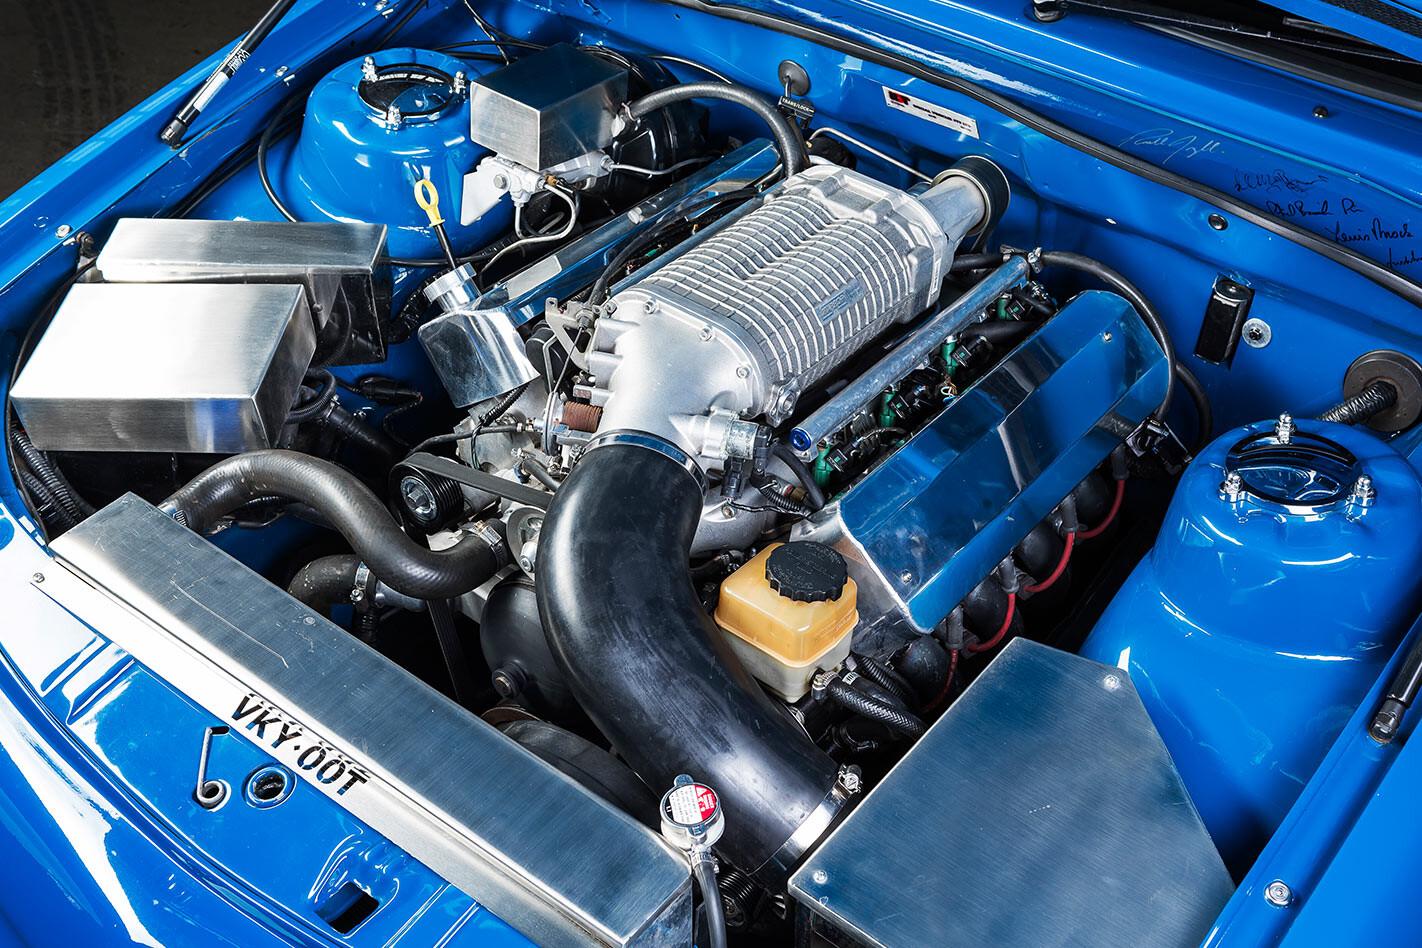 Holden VK one tonner engine bay